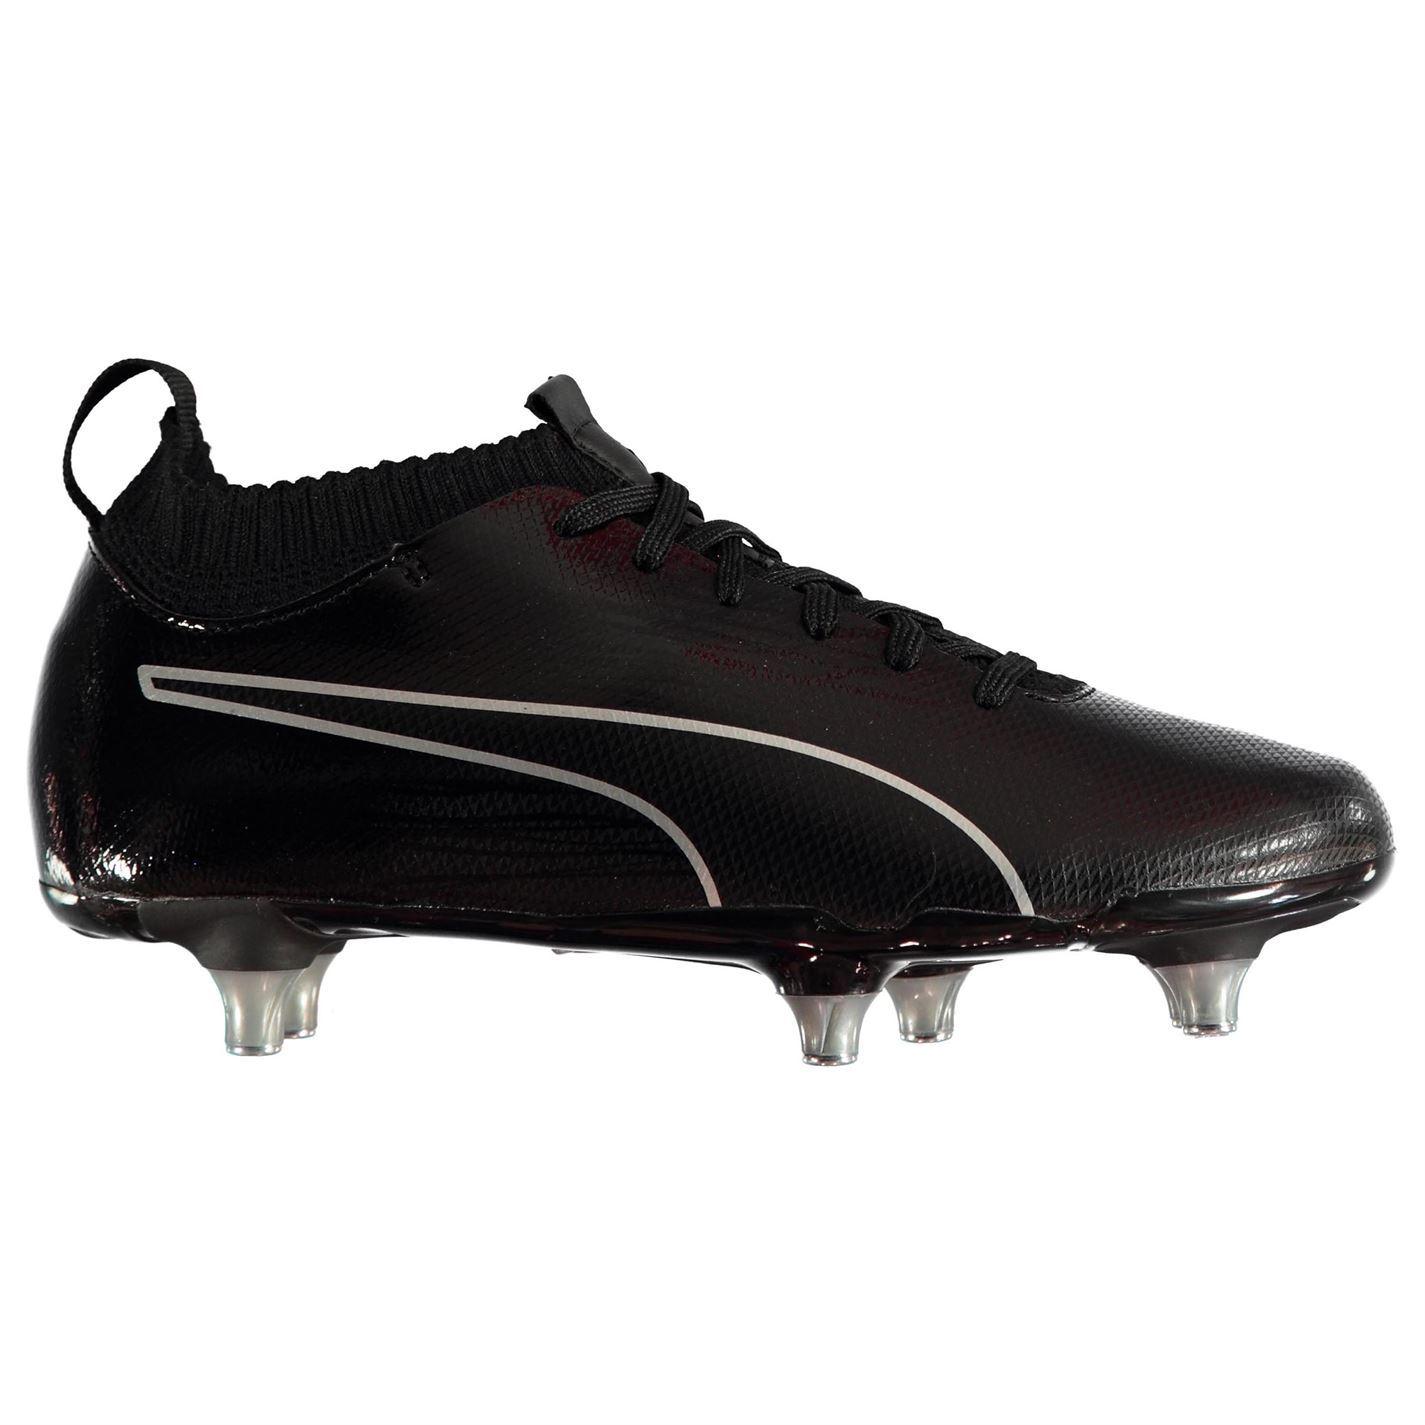 Football enfant PUMA Puma Evoknit FG Chaussures de football pour chaussures de football pour enfants Tige ferme Blanc noir